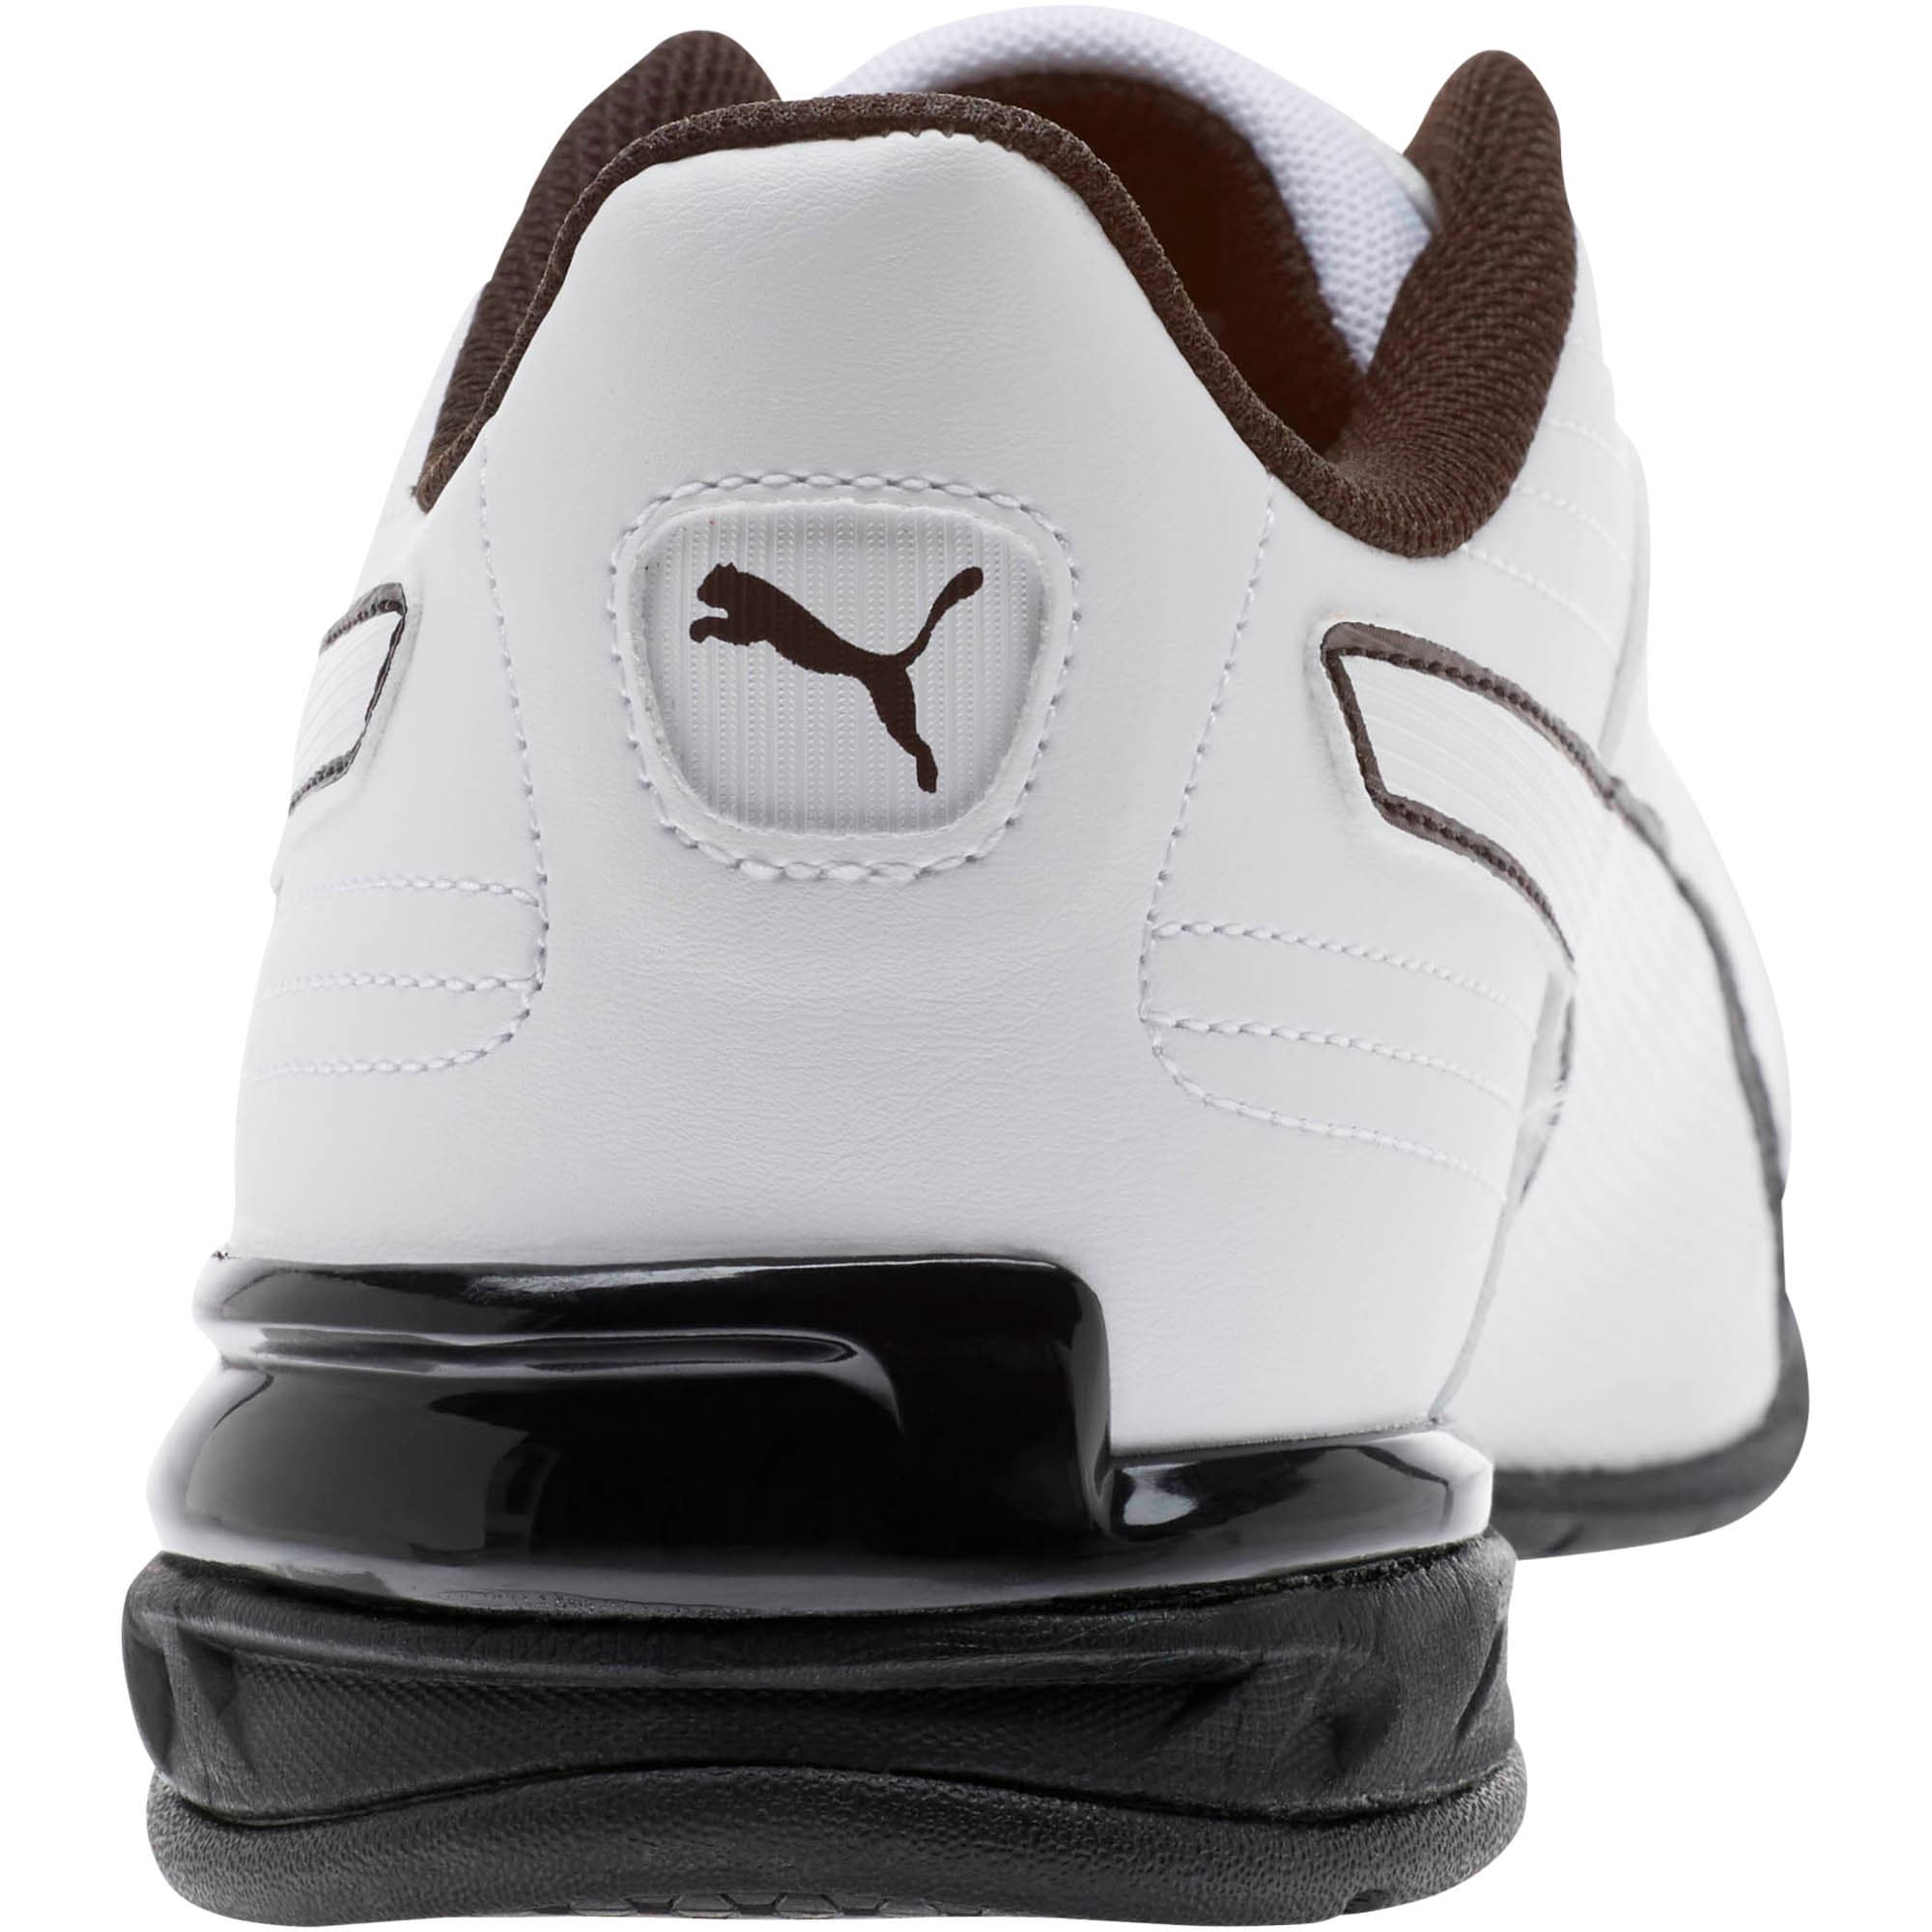 Thumbnail 4 of Super Levitate Men's Running Shoes, Puma White-Puma Black, medium